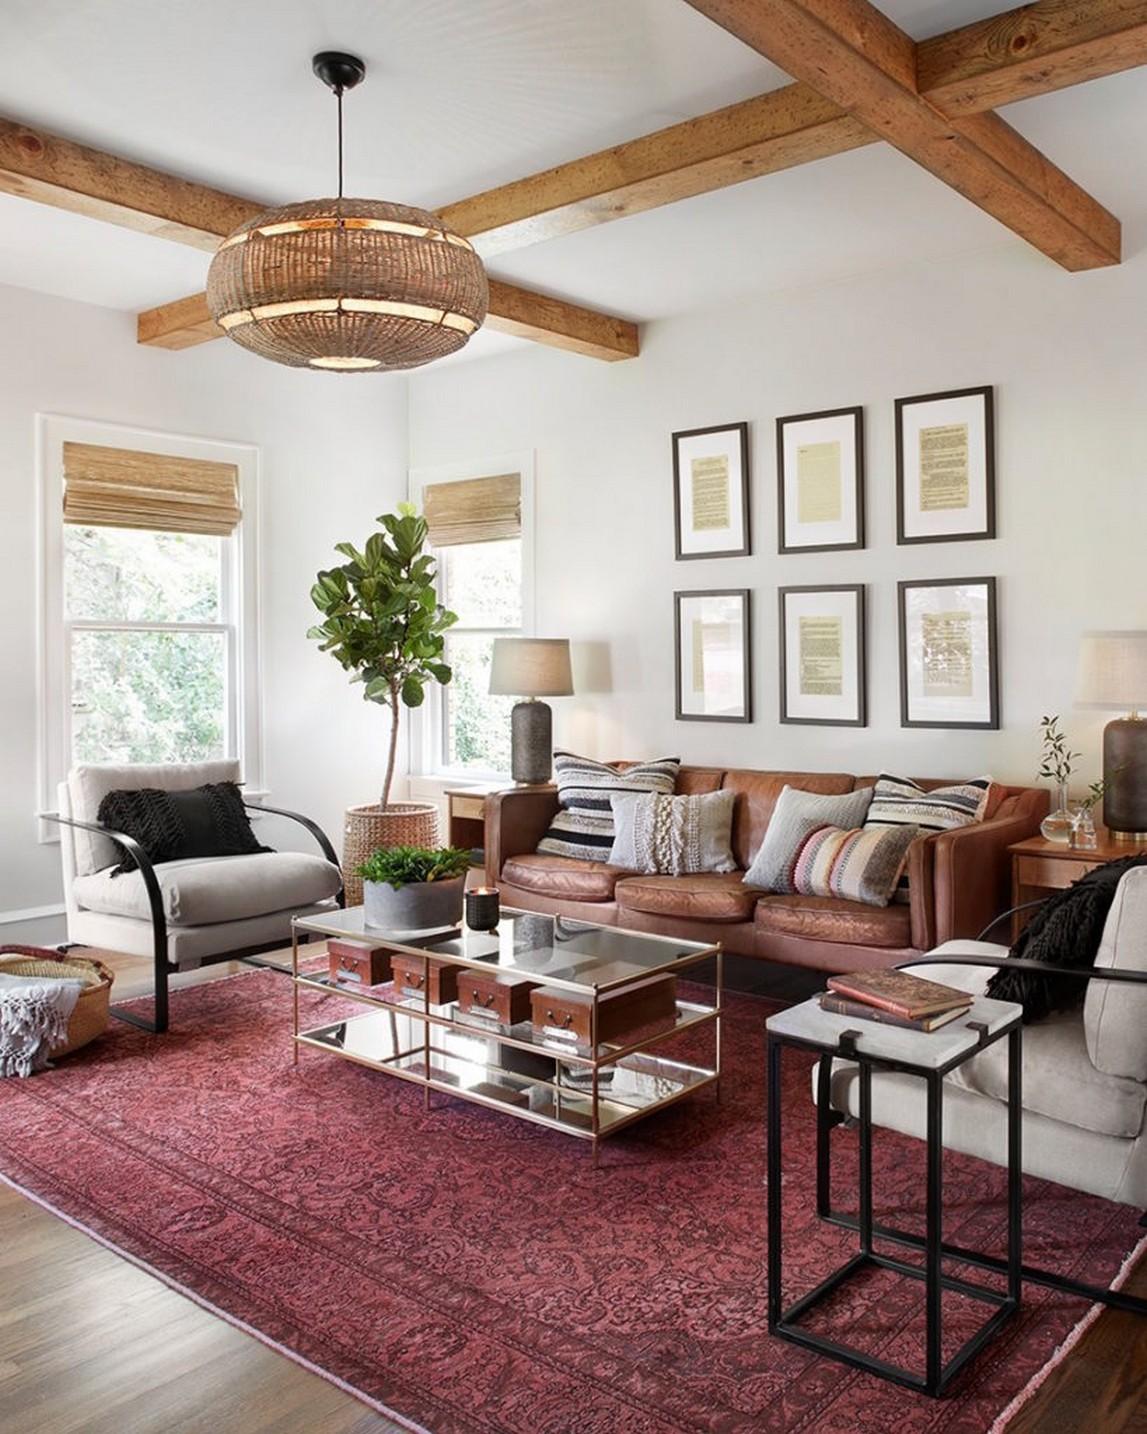 Terrific Designs Idea of Living Room You Must Follow